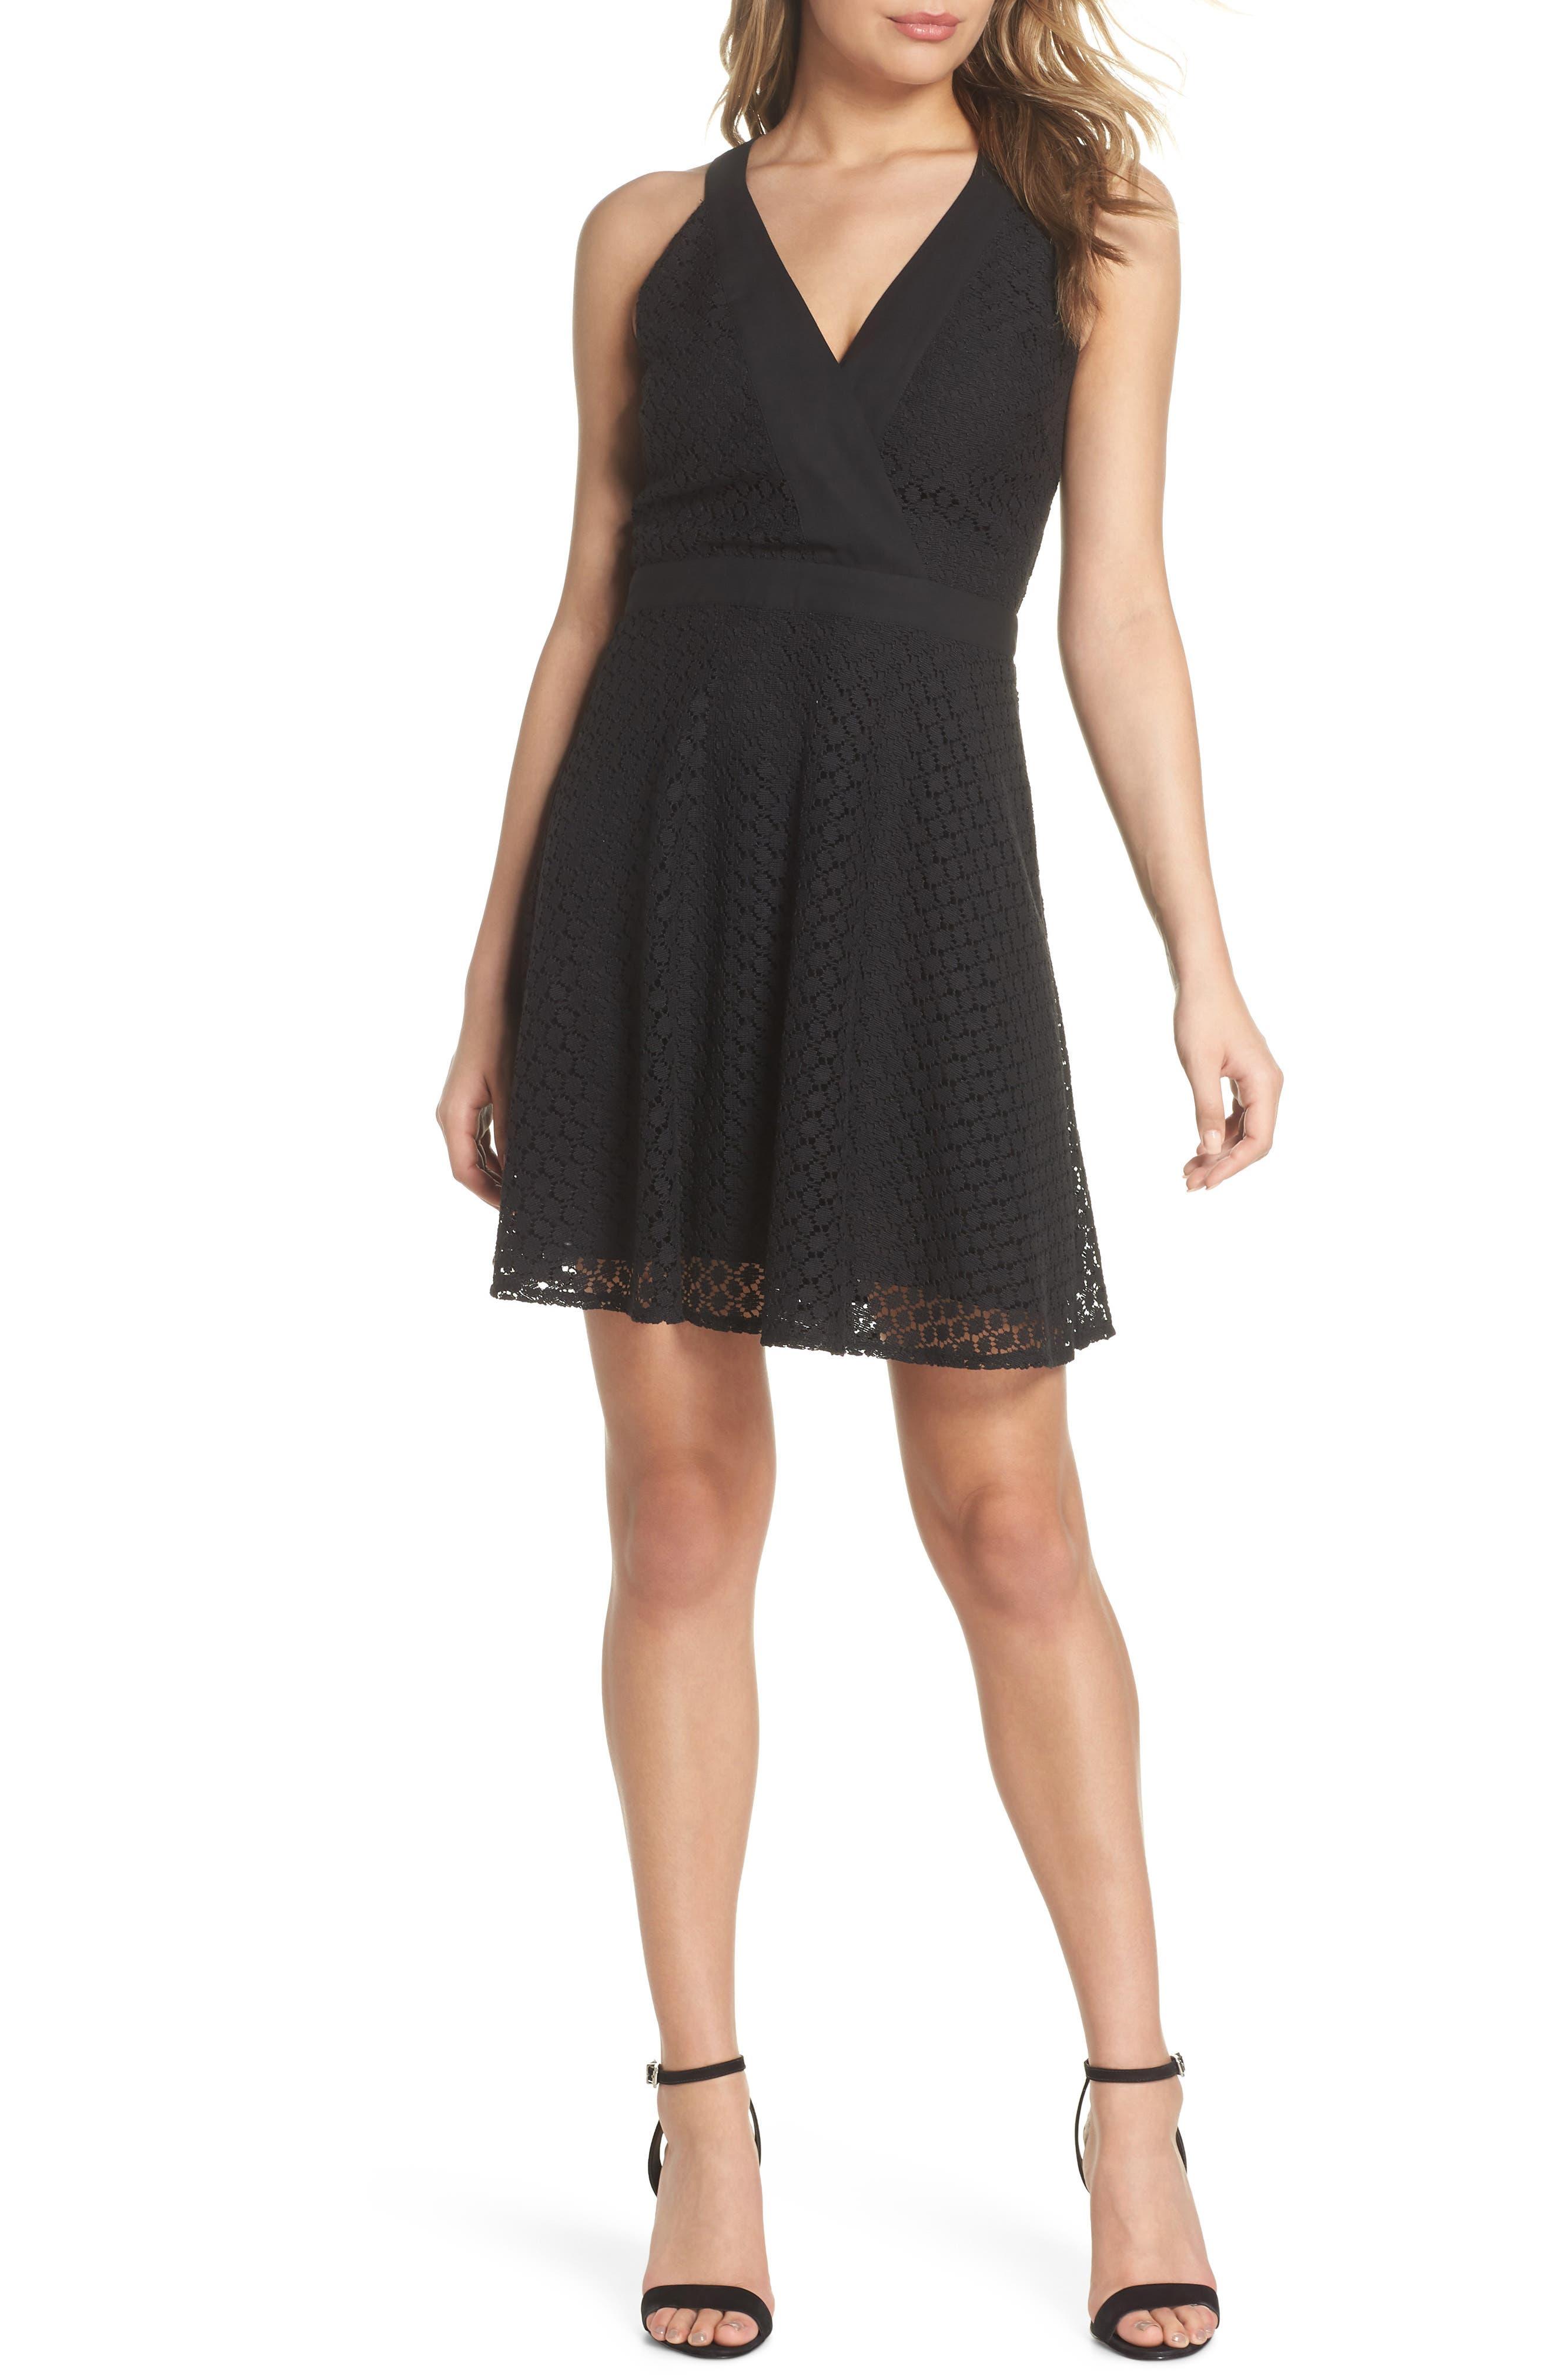 19 COOPER Lace Halter Dress, Main, color, 001